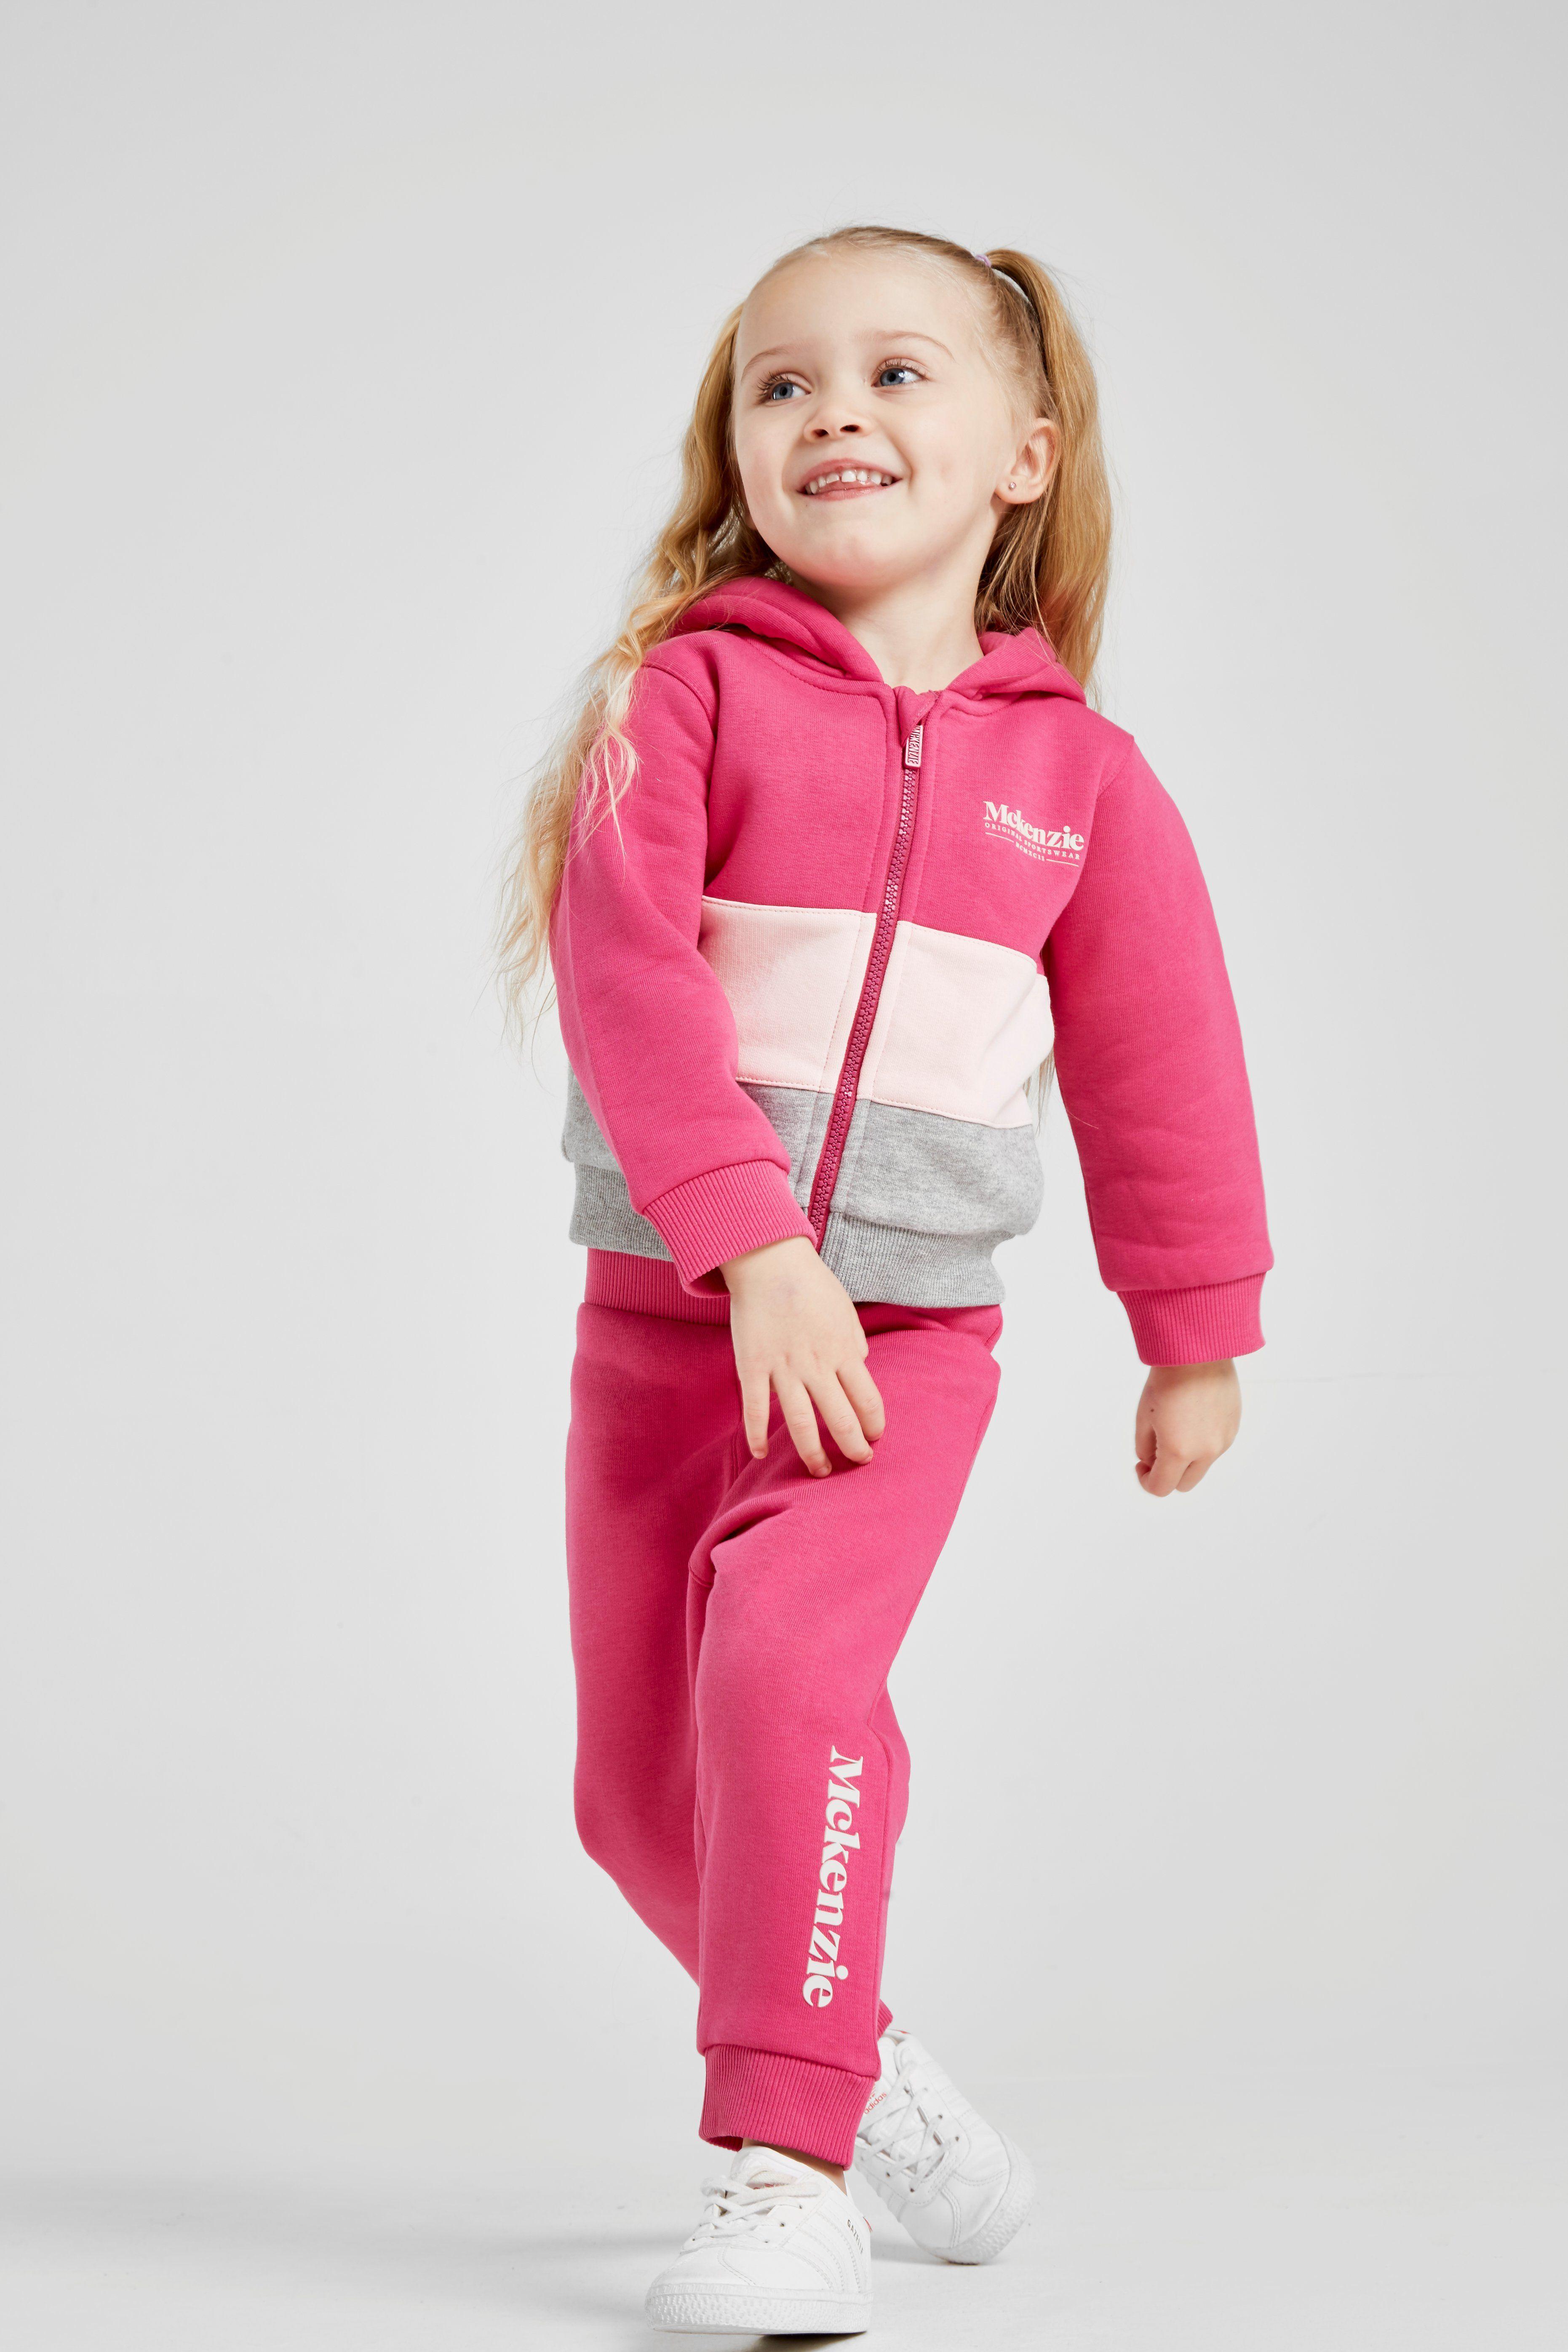 McKenzie Survêtement Girls' Micro Binx Bébé